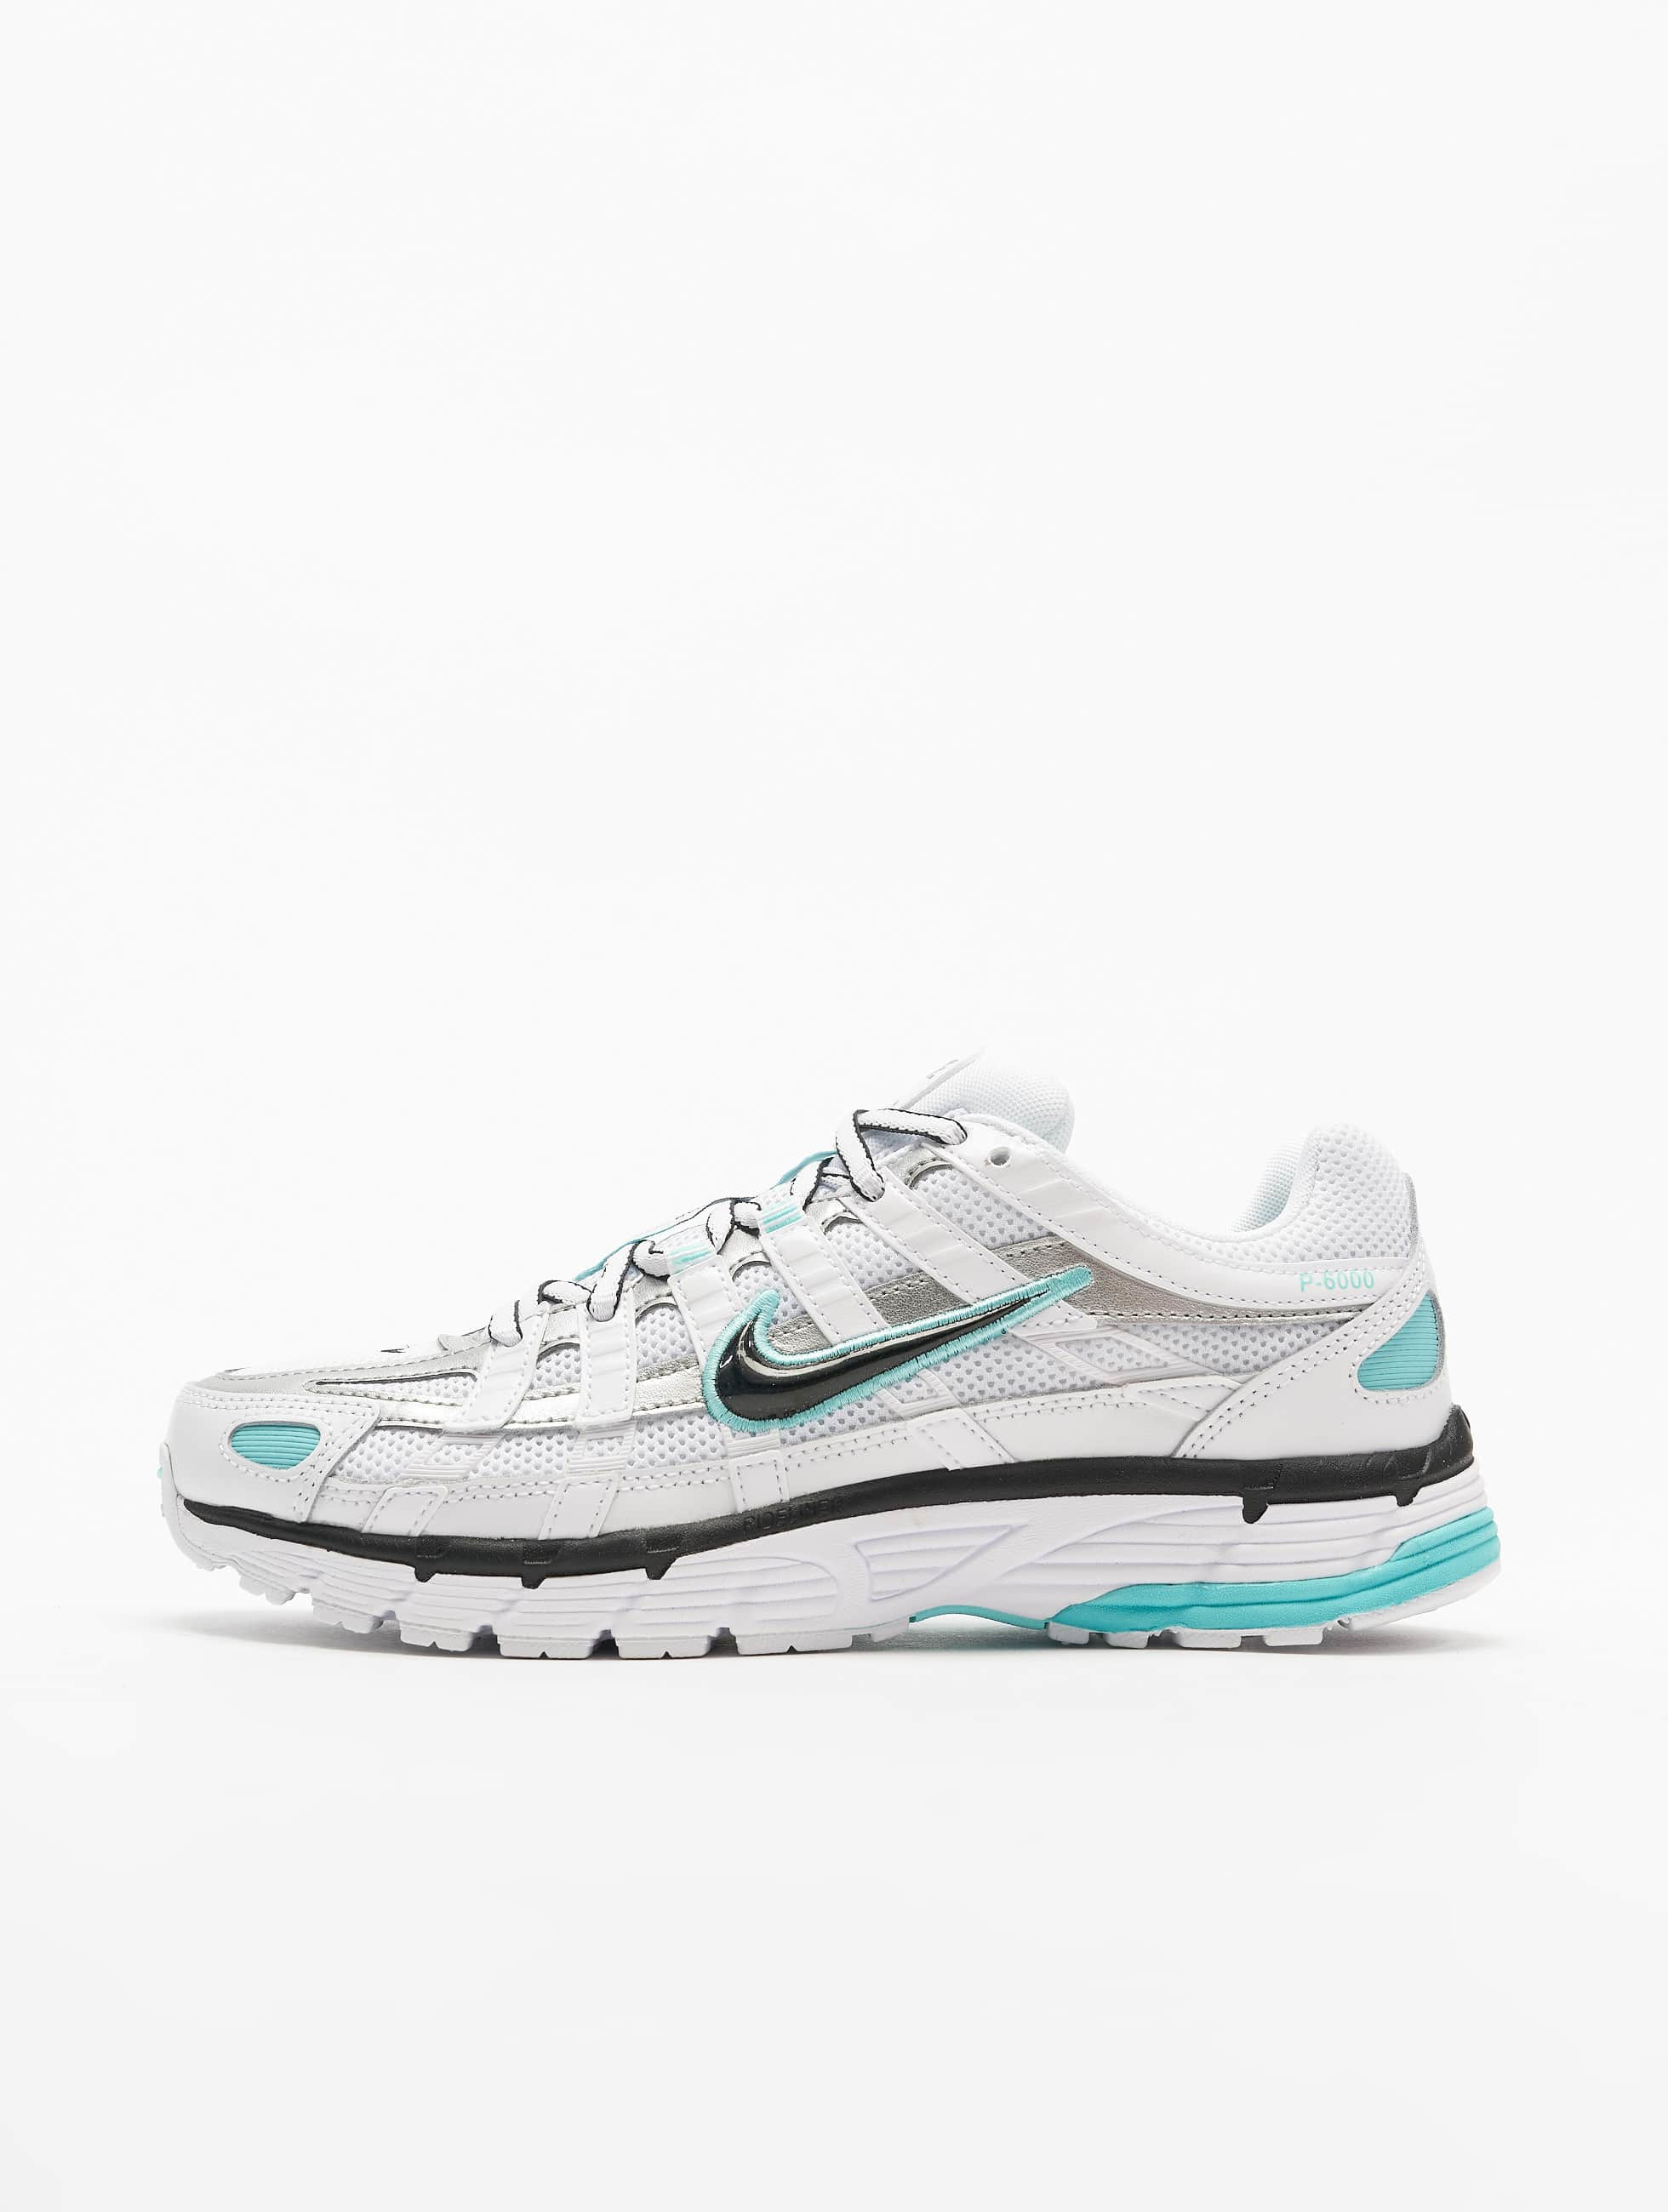 Nike P 6000 Sneakers WhiteBlackMetallic SilvernLight Aqua